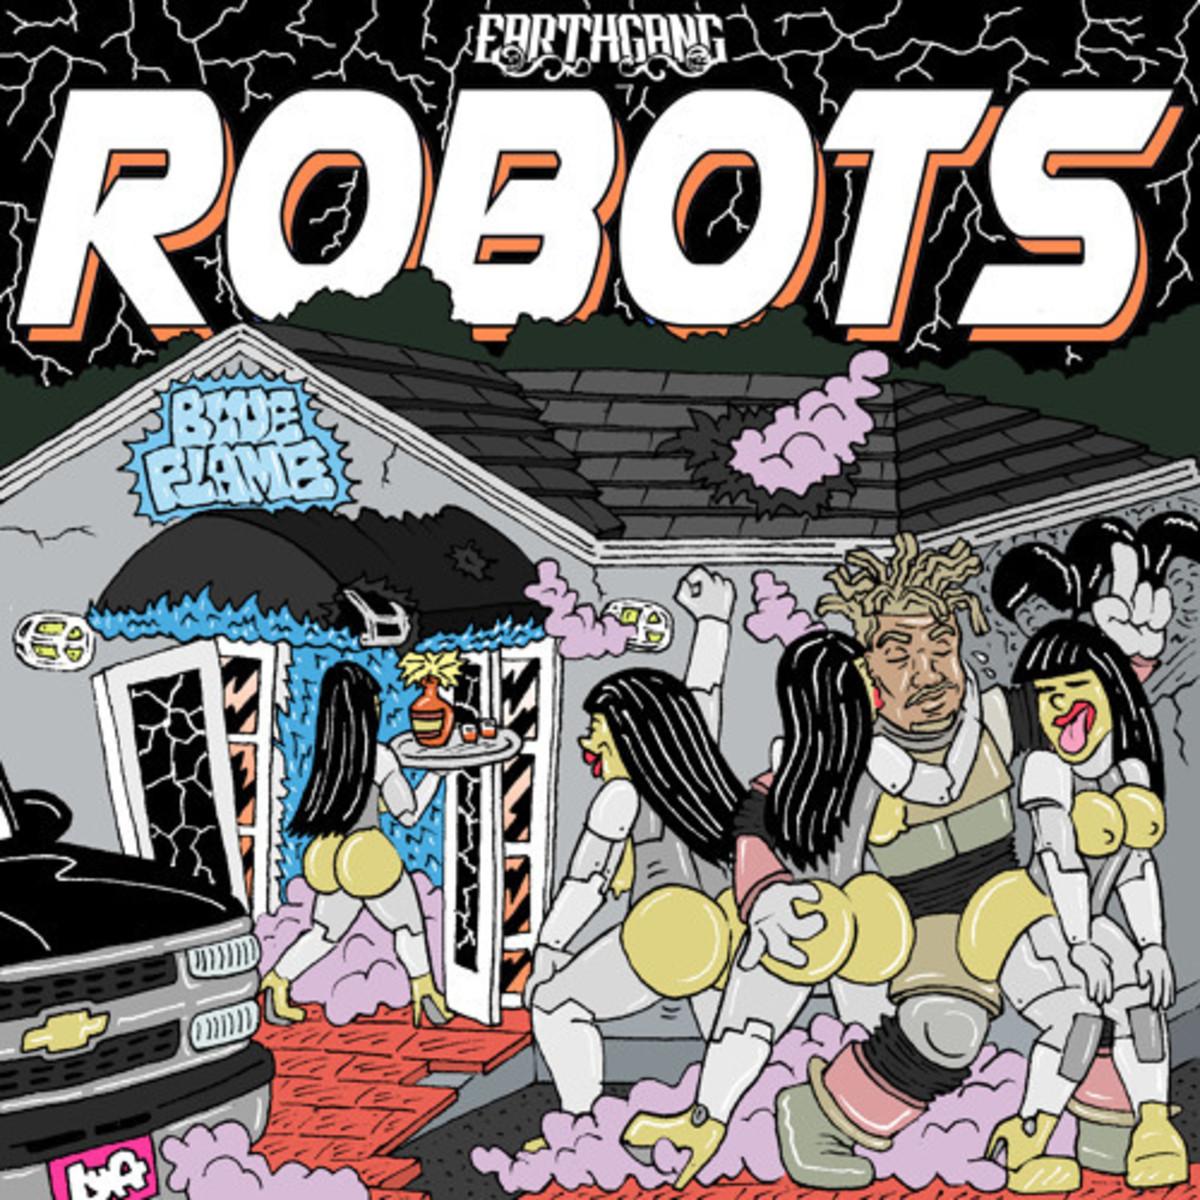 earthgang-robots.jpg